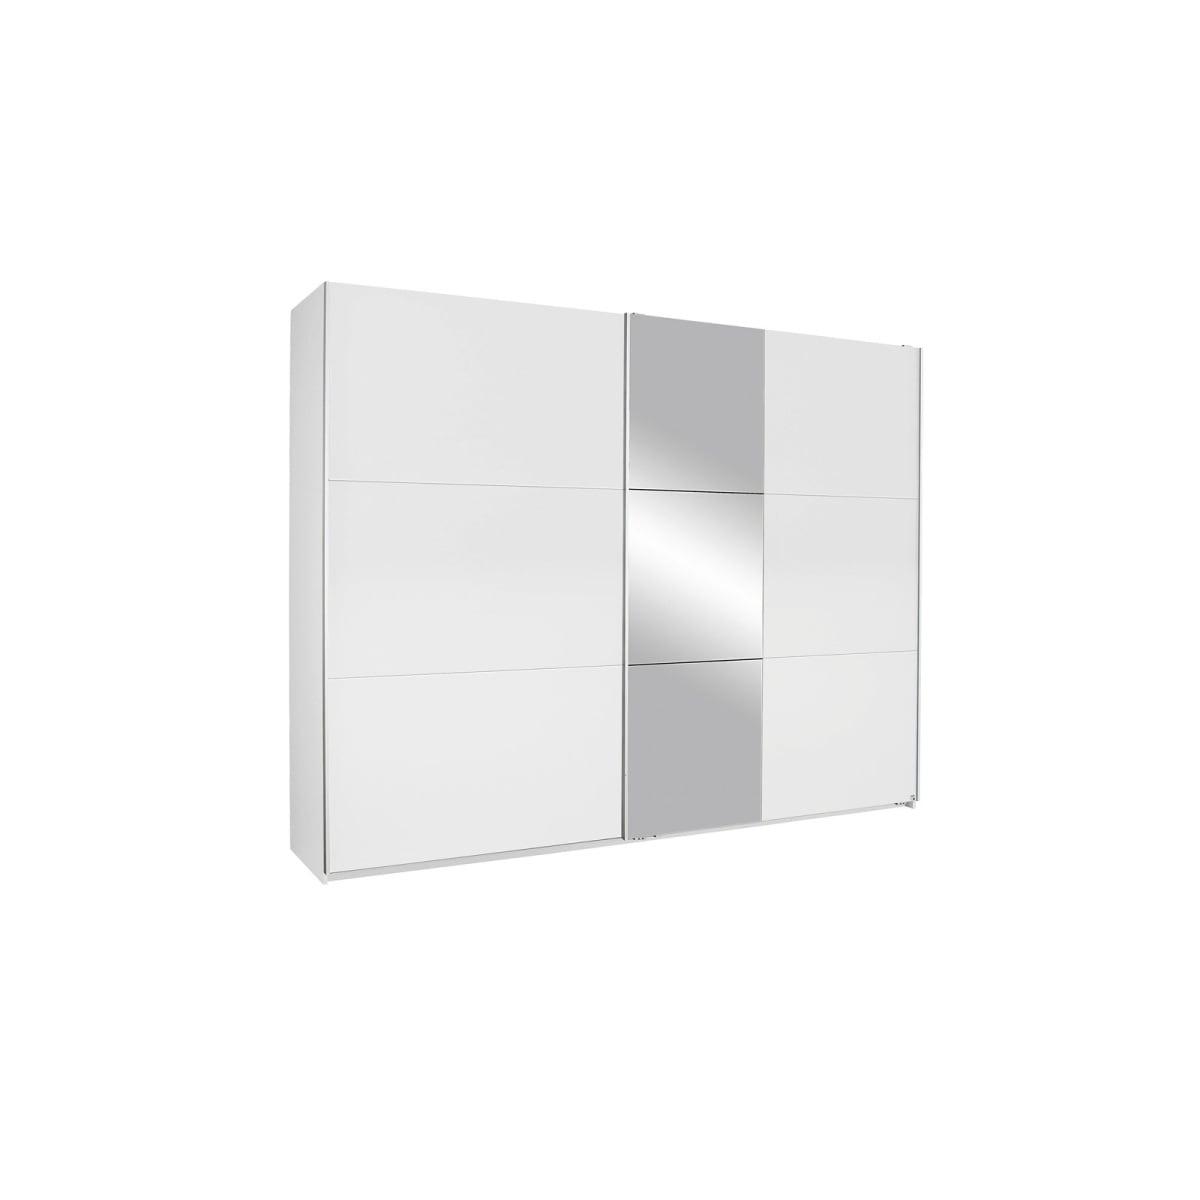 phill hill kleiderschrank chrono alpinwei ca 261 x 210 x 58 cm porta. Black Bedroom Furniture Sets. Home Design Ideas